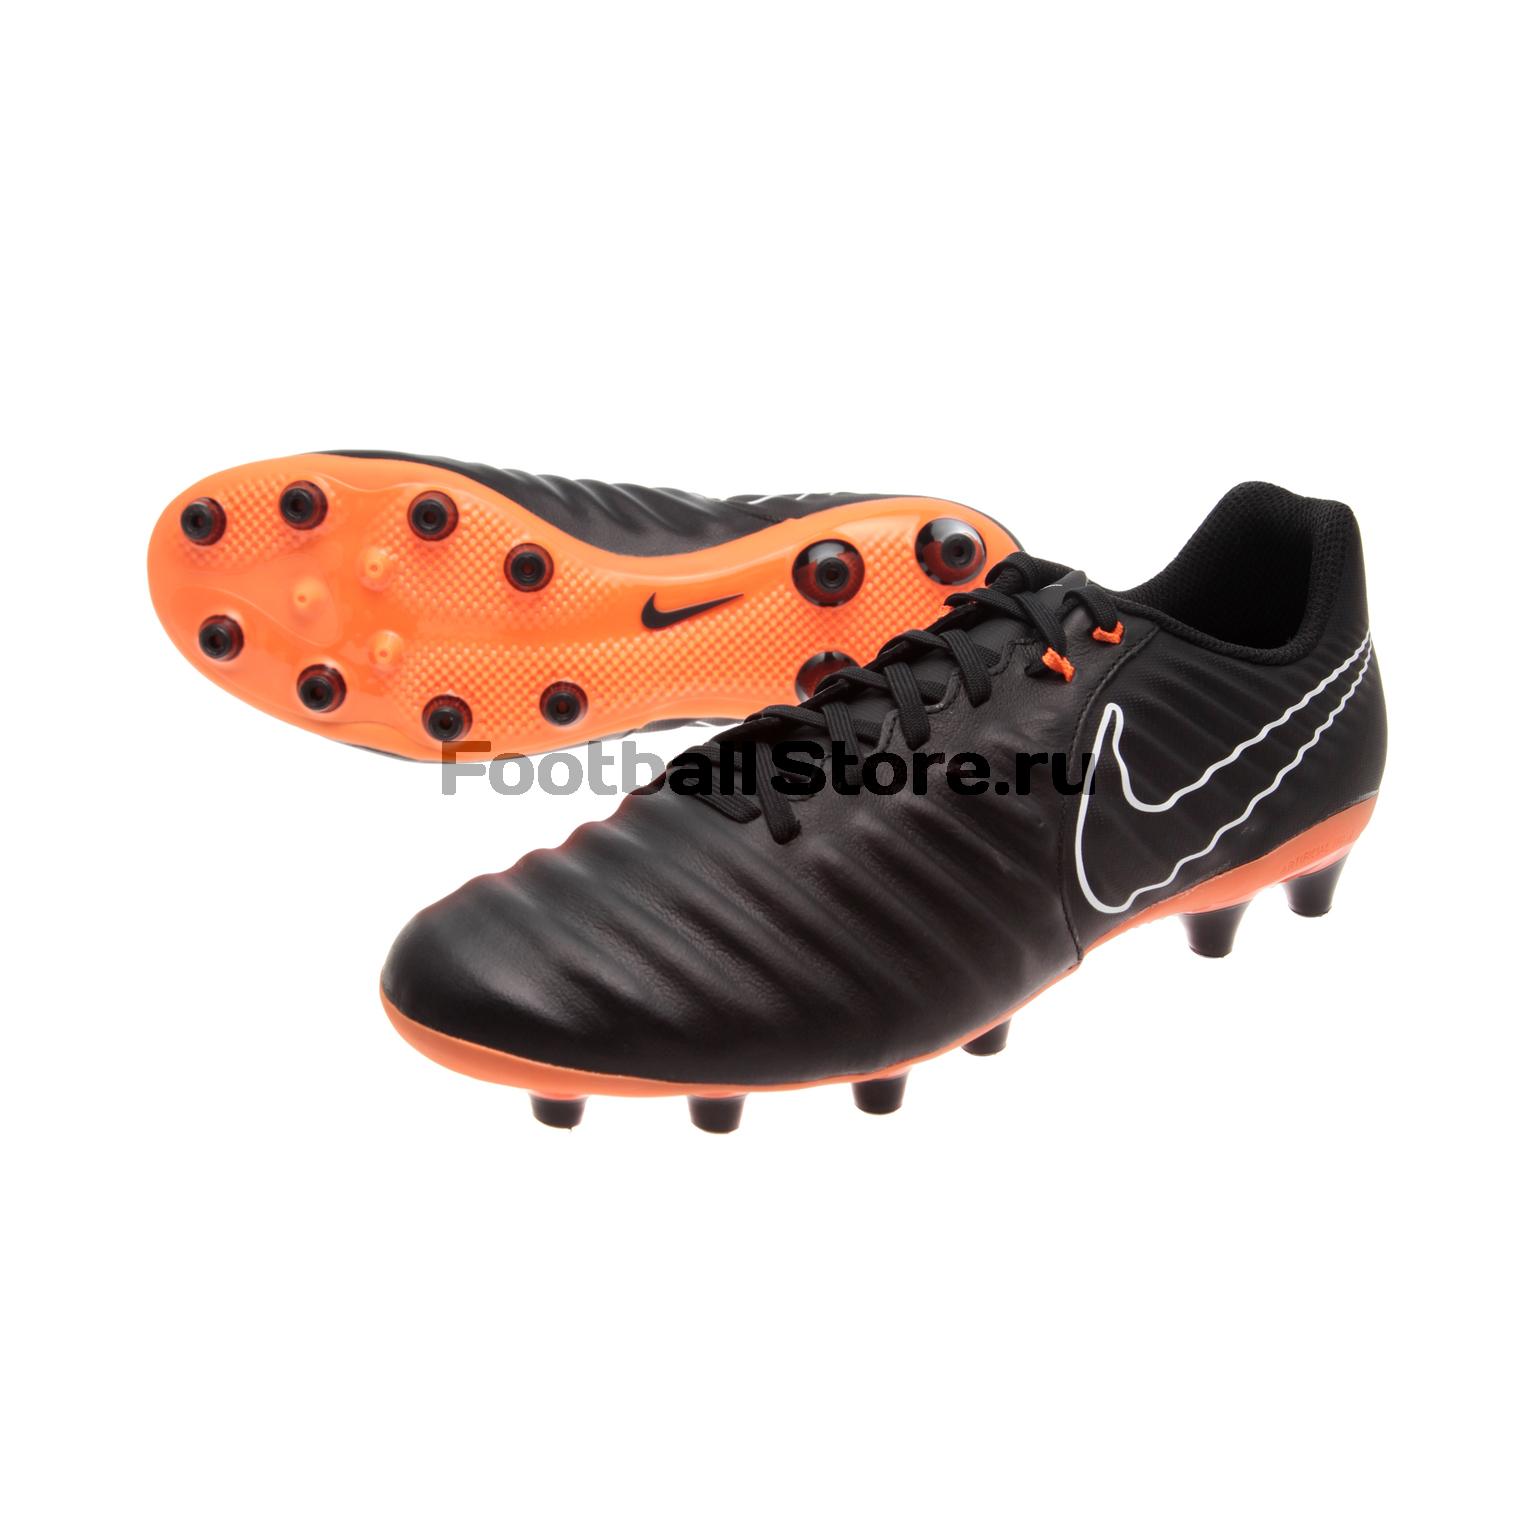 75d2bfe9 Бутсы Nike Legend 7 Academy AG-PRO AH7239-080 – купить бутсы в ...